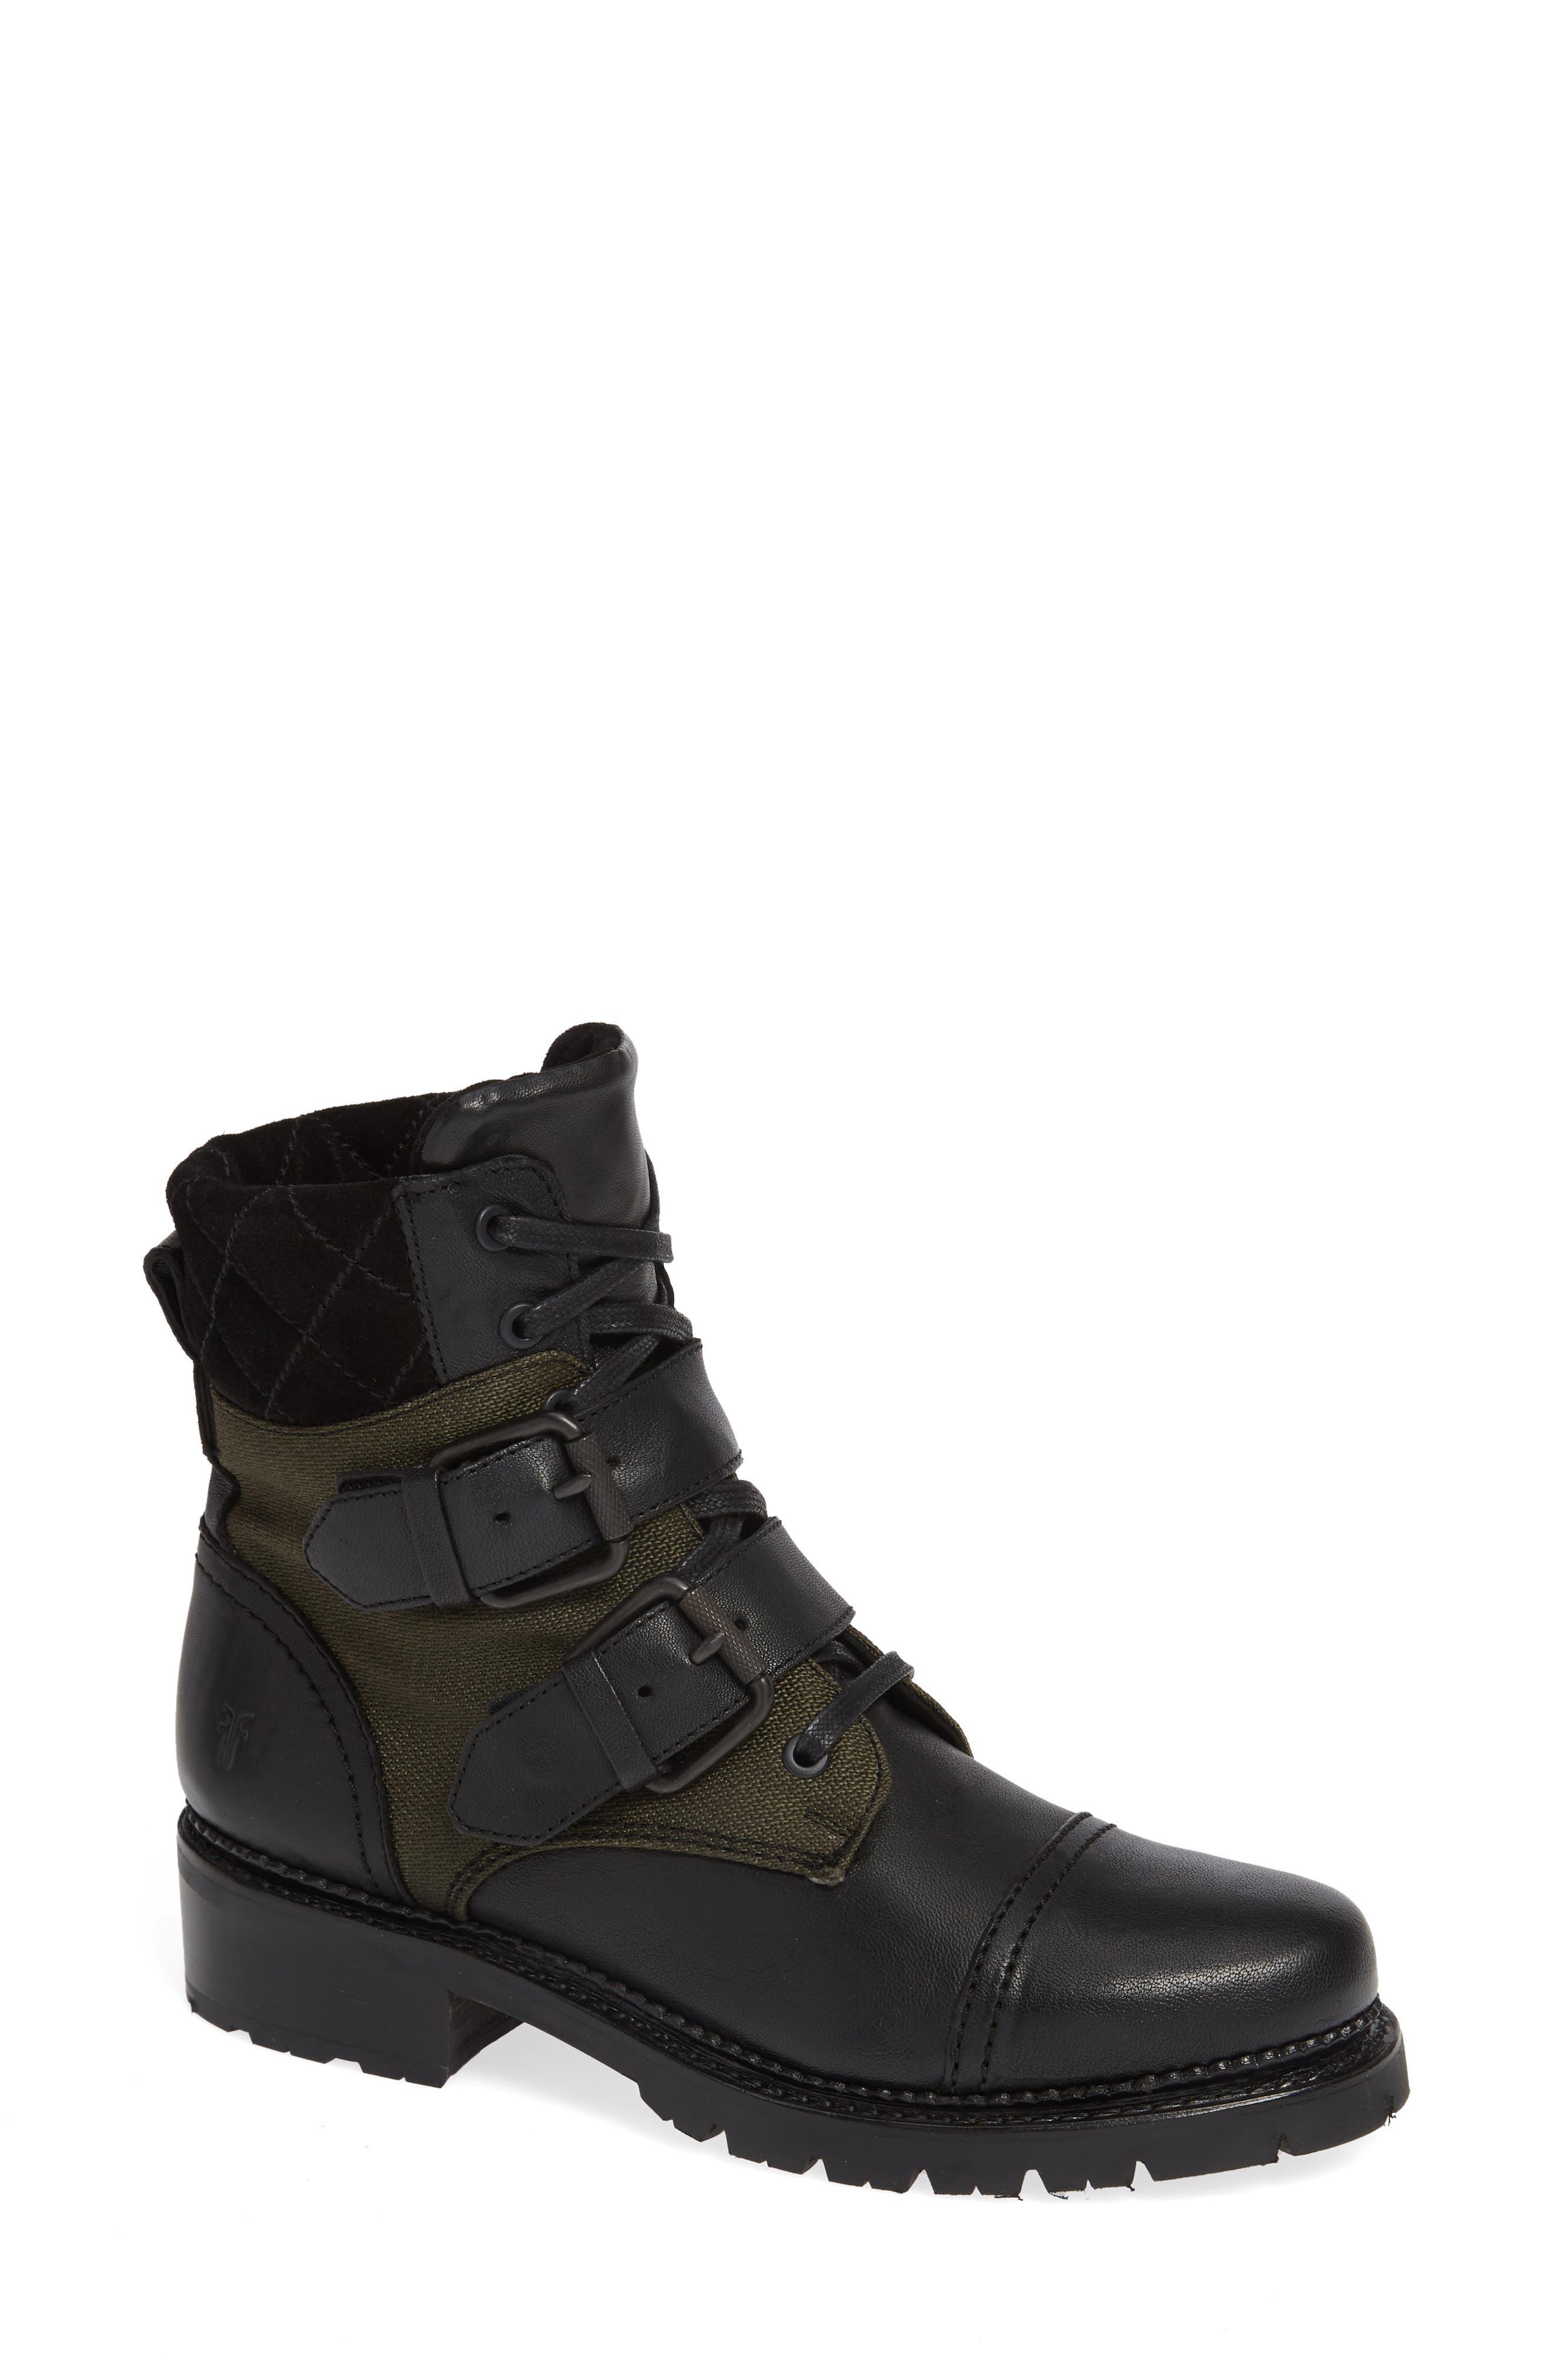 Frye Samantha Hiking Boot- Black